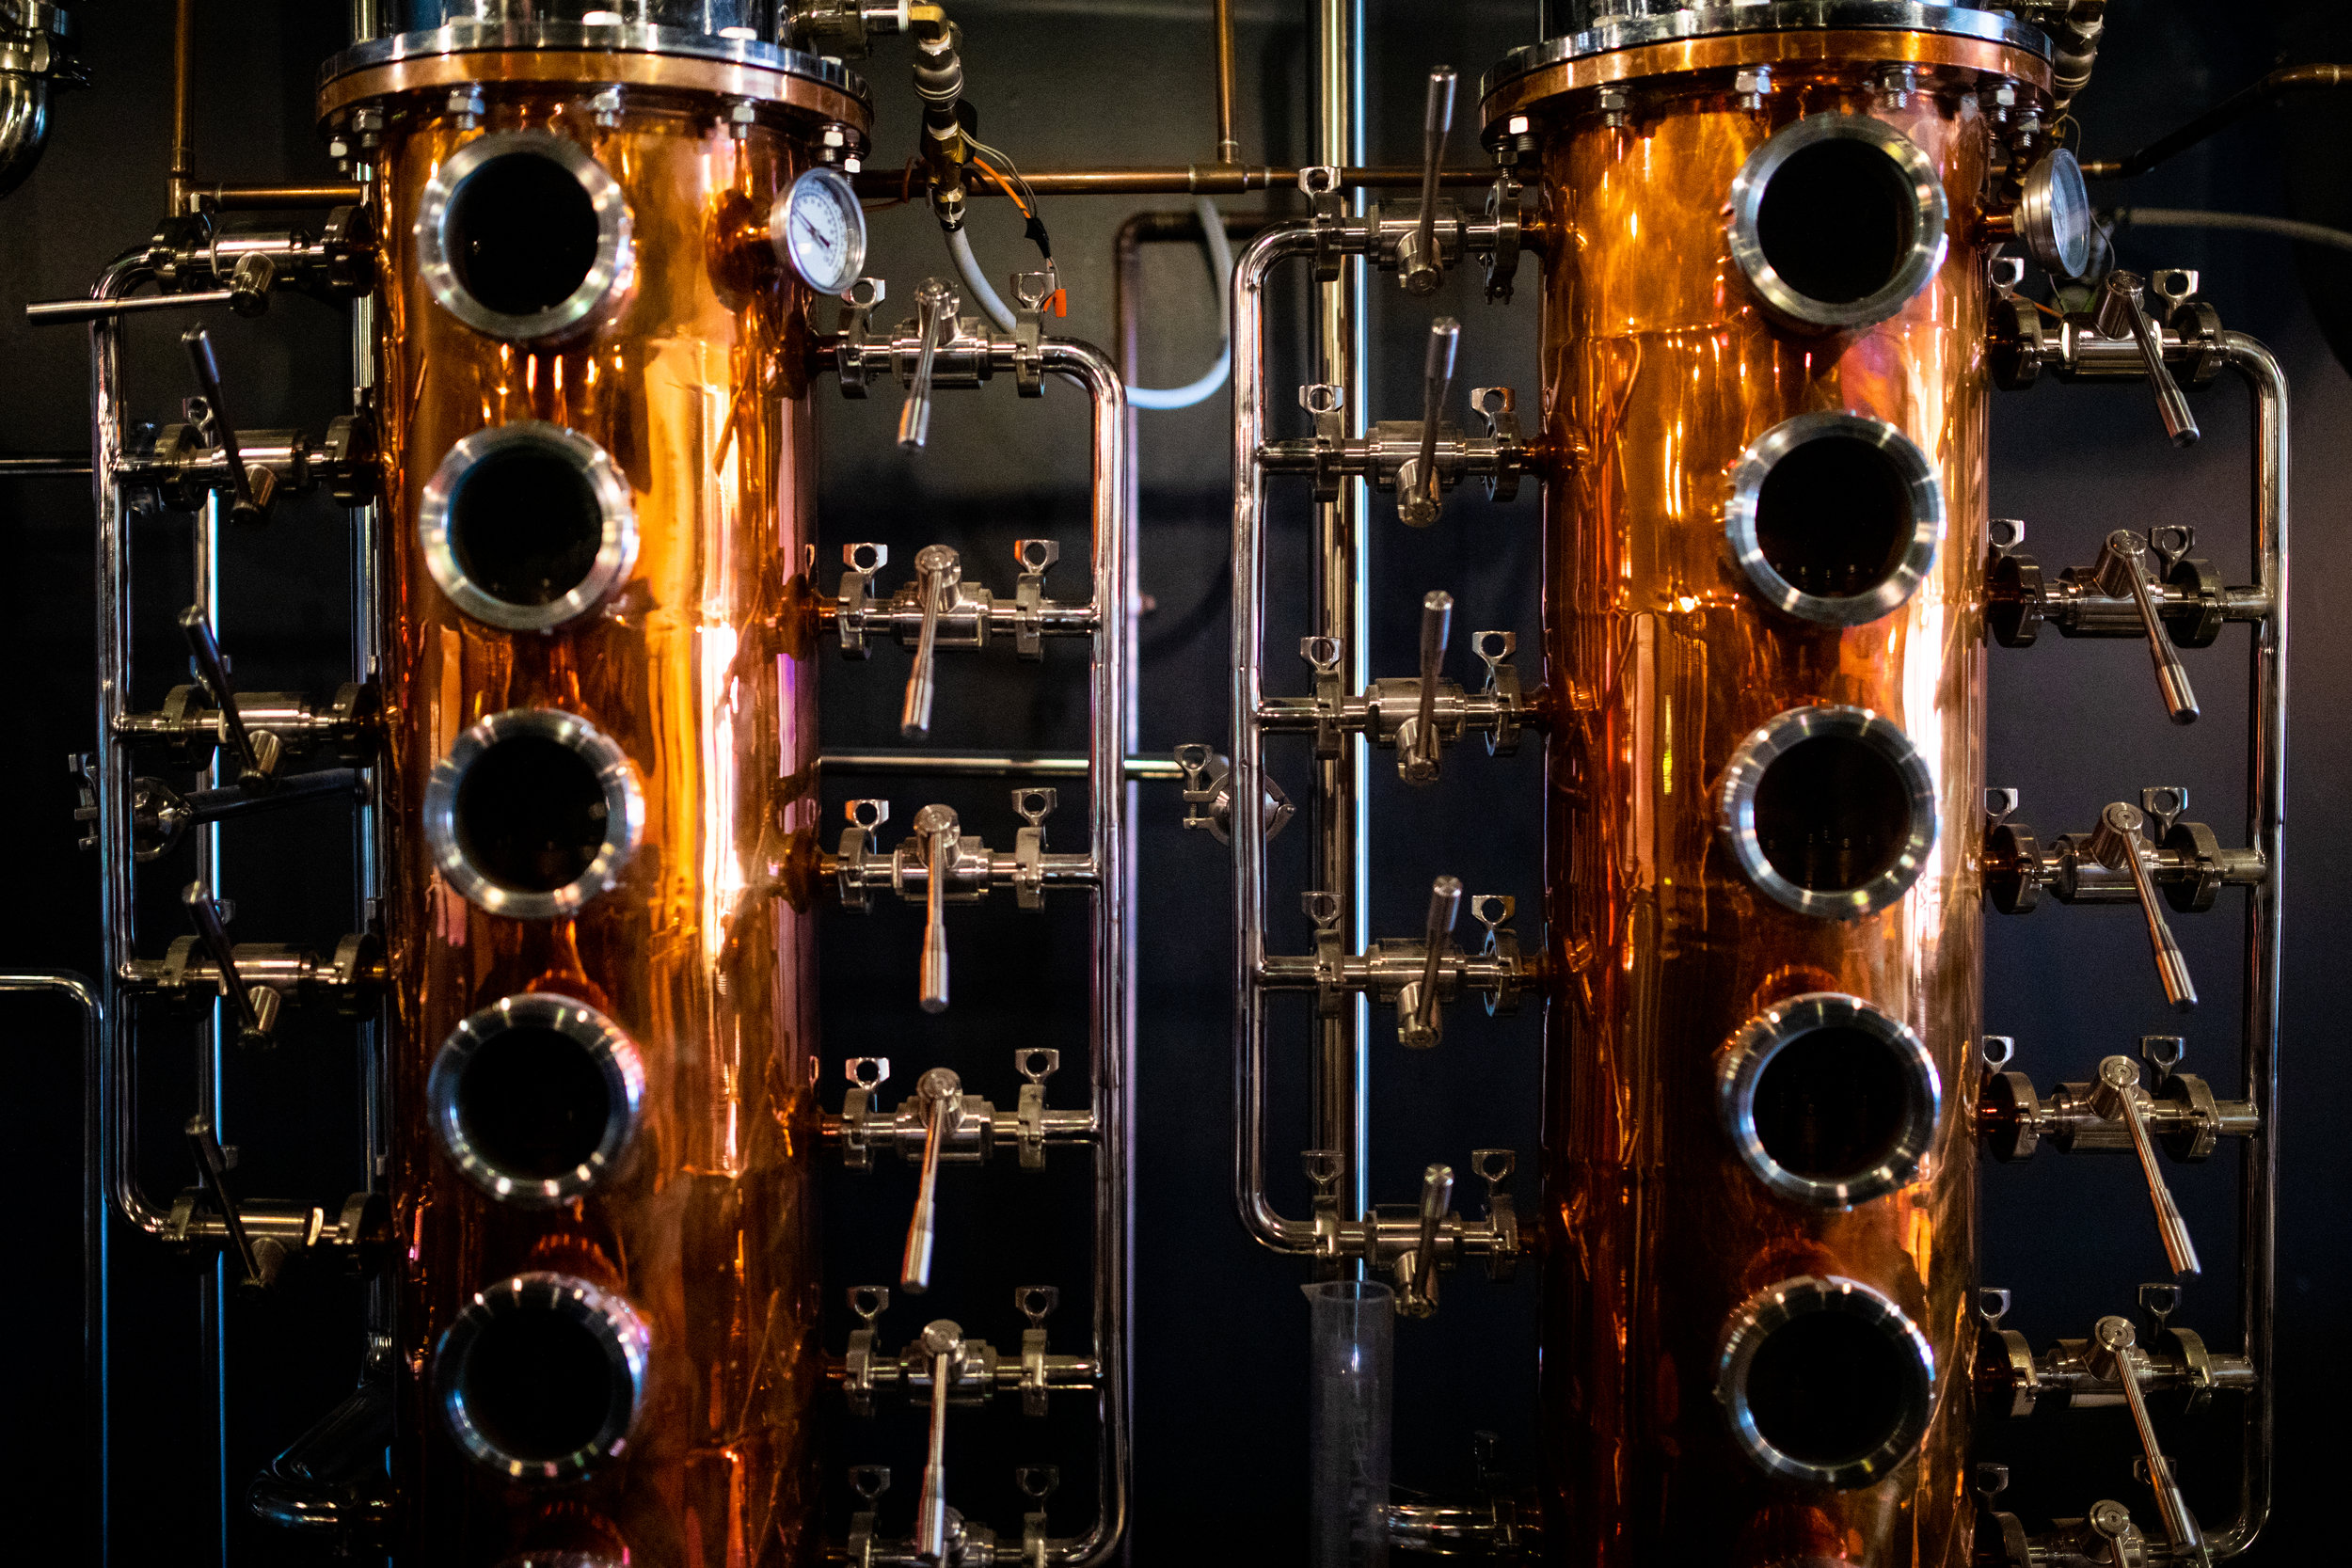 Cole Hofstra - http---www.colehofstra.com - Cole Hofstra Photography - Monashee distilling - Revelsroke Distilling - Monashee-5.jpg